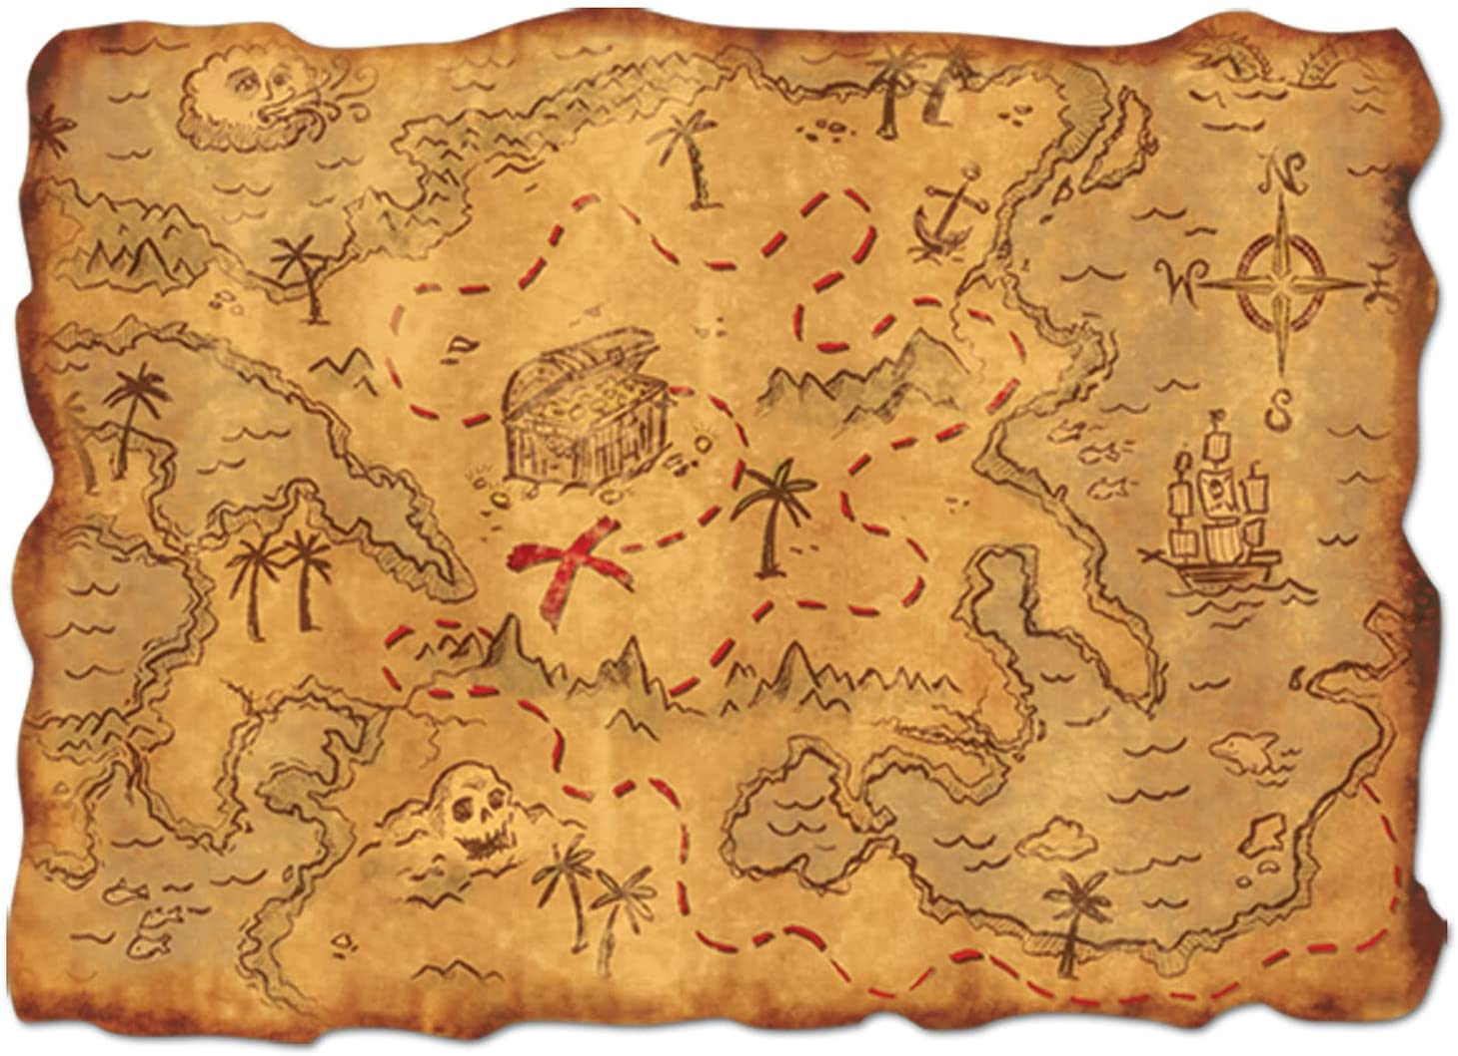 "Beistle Plastic Treasure Map, Multicolored, 12"" x 18"" : Amazon.co.uk: DIY &  Tools"